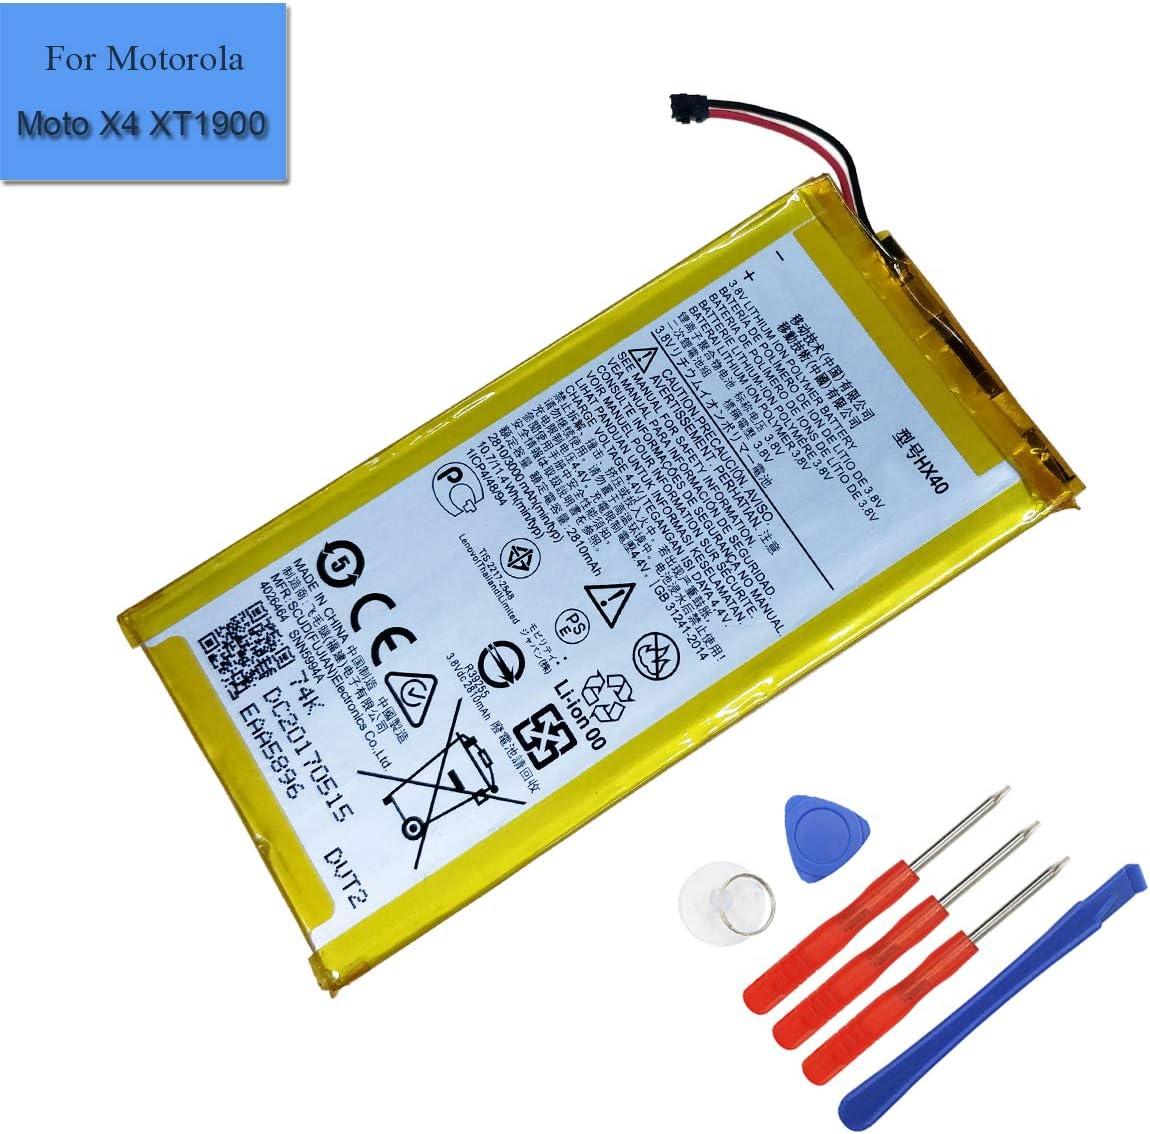 Bateria para polímero de litio HX40 para Moto X4 MotoX4 Dual